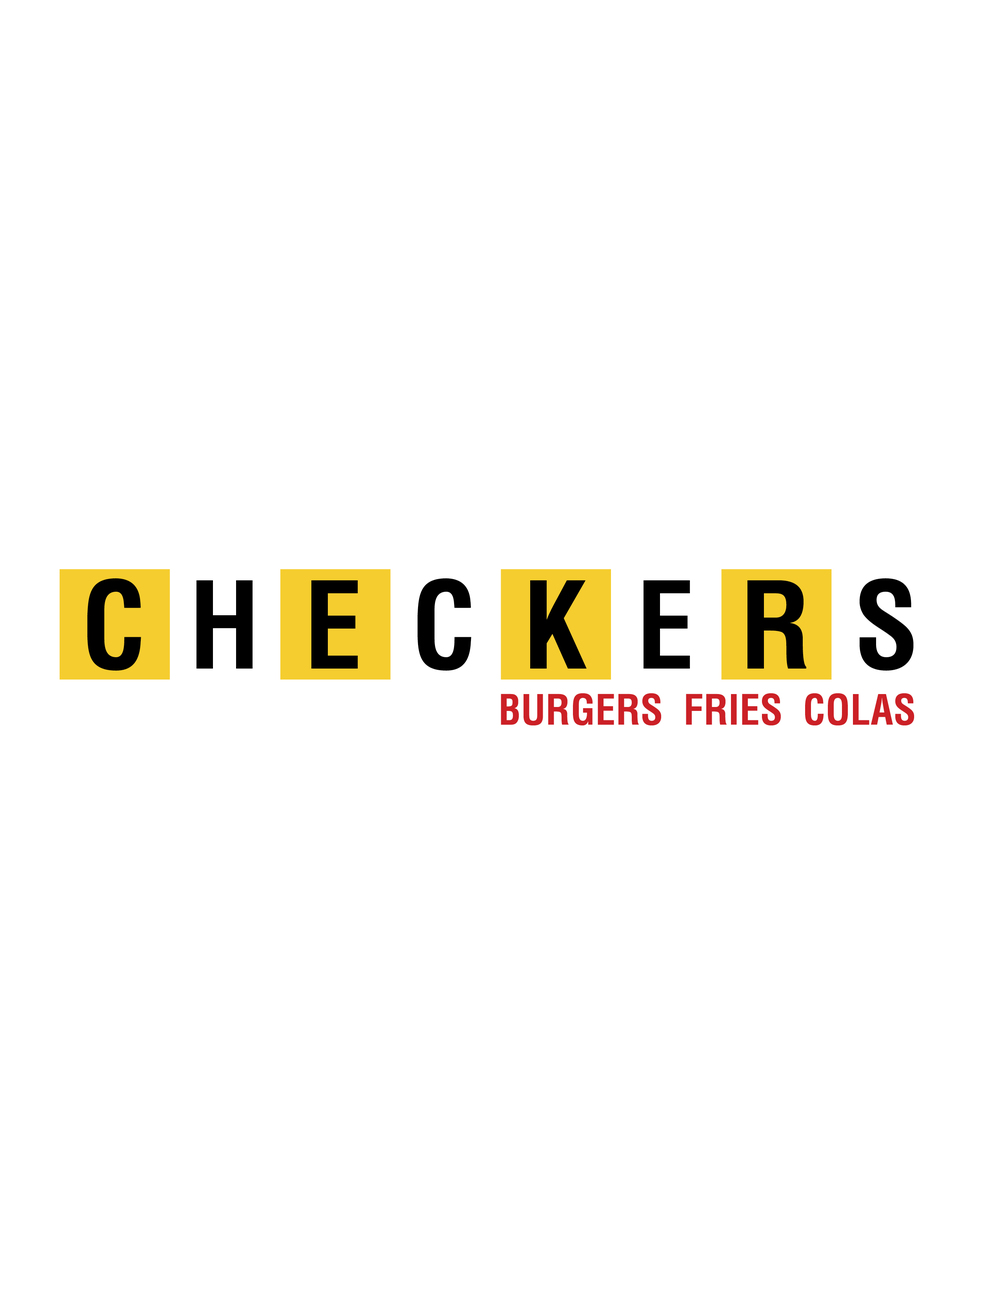 CheckersLogo.jpg